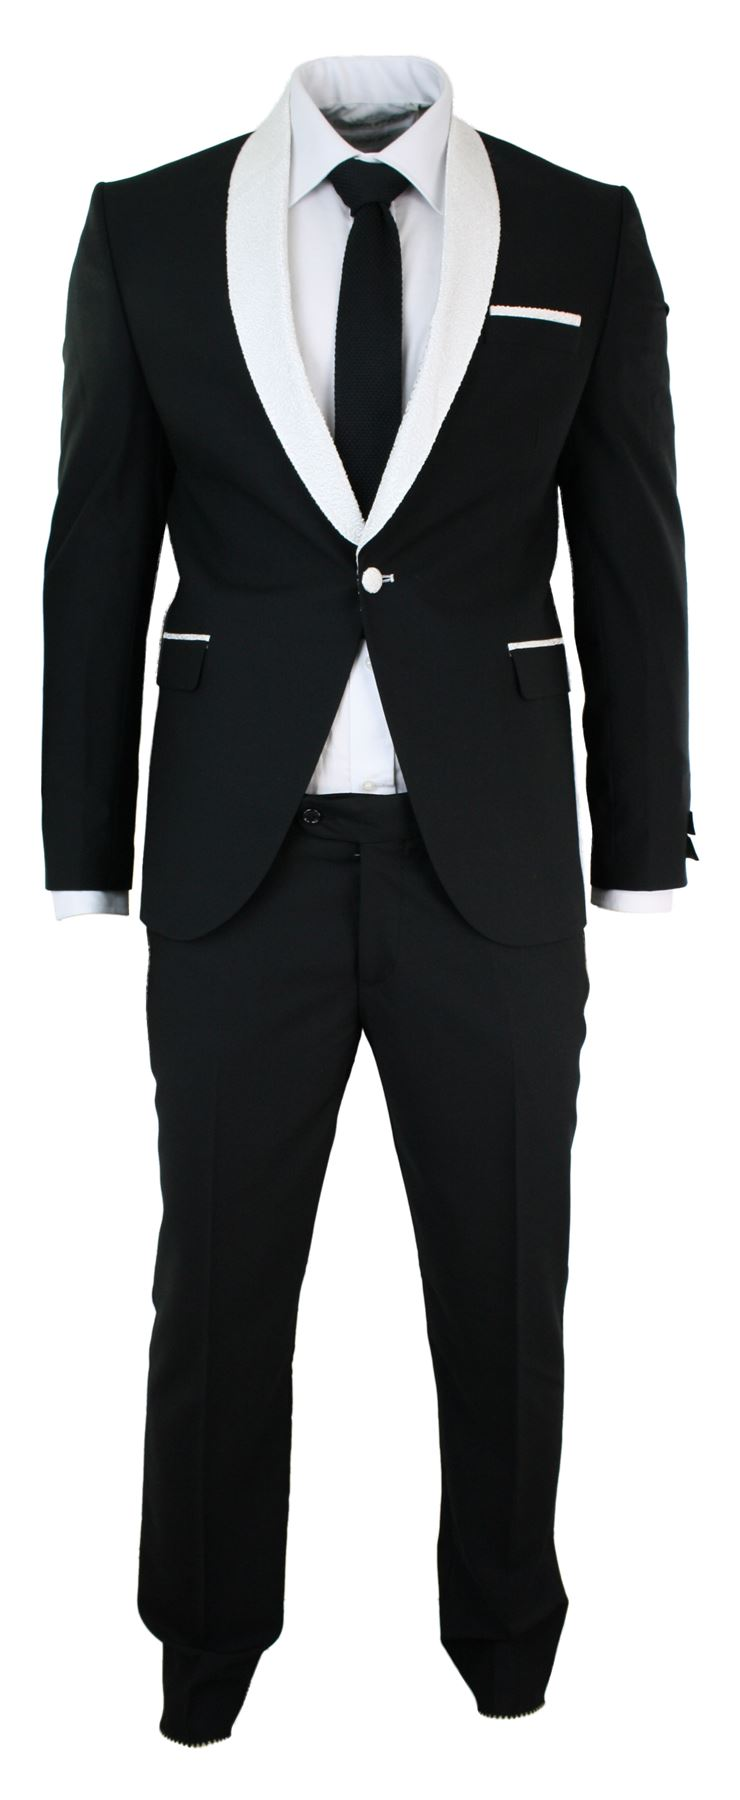 Mens Slim Fit Black White Shawl Paisley Collar Suit Wedding Party ...